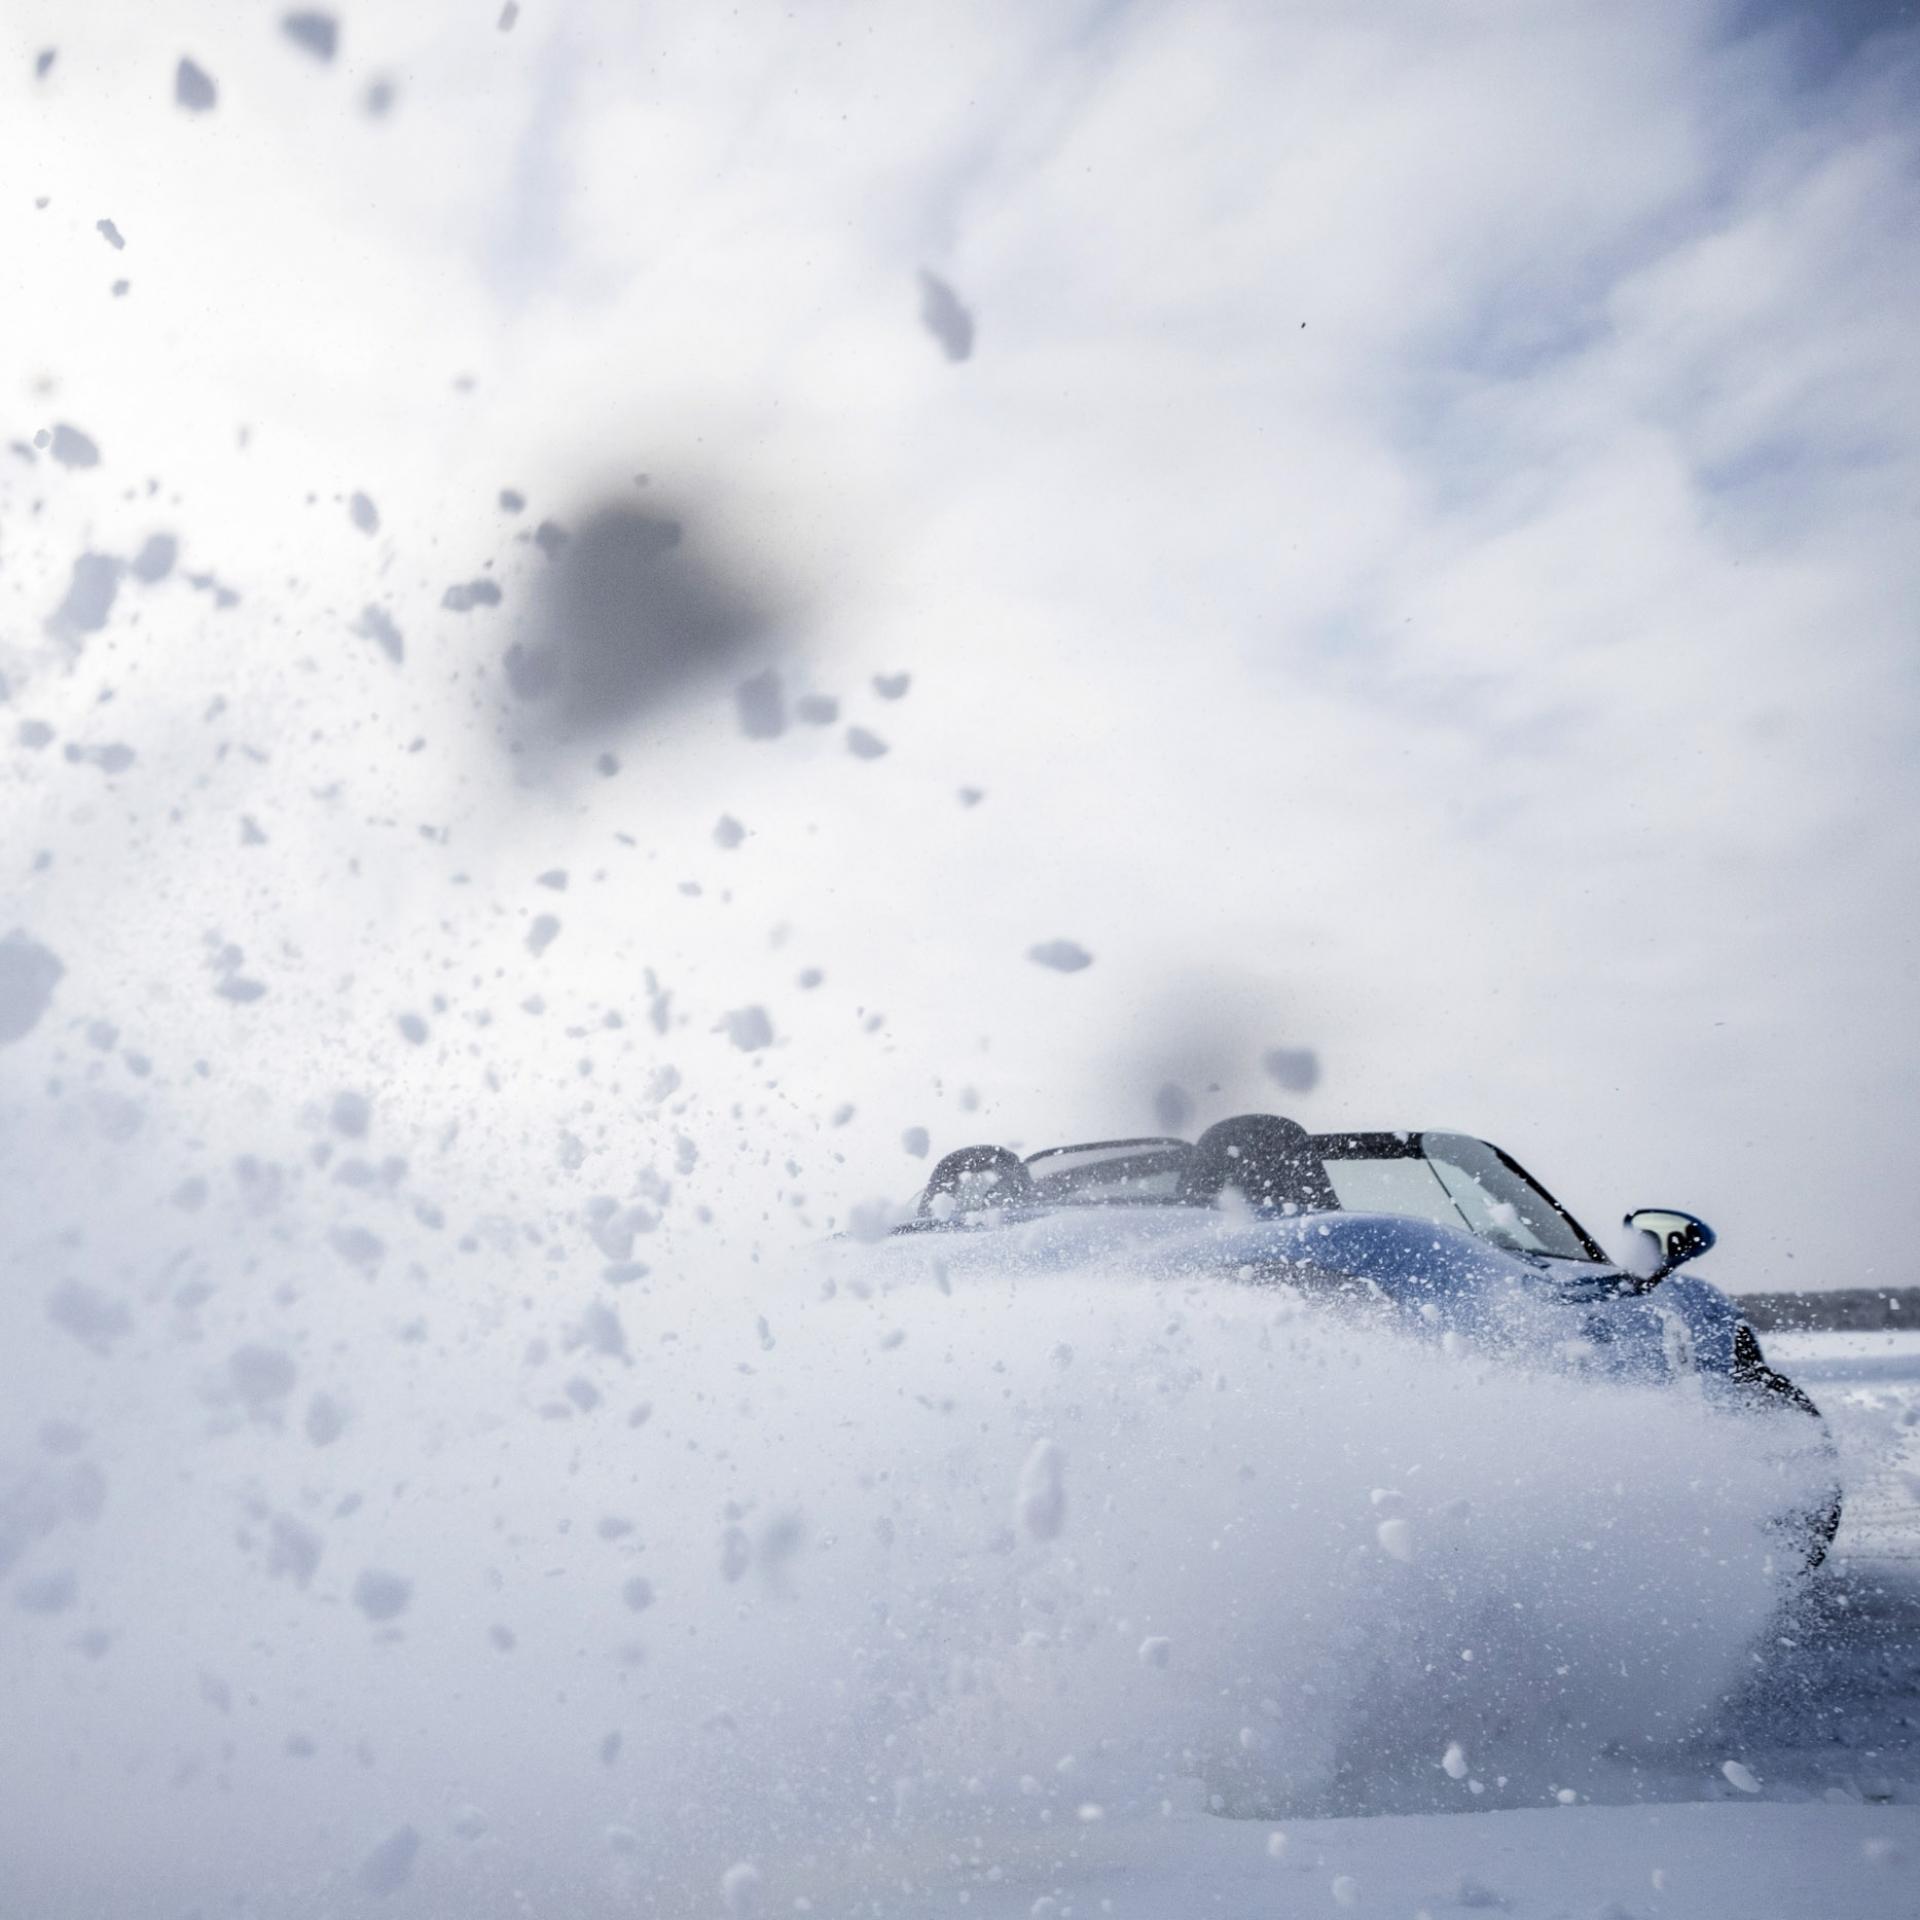 Weitwinkelzoom Canon EF 16-35mm f/2.8 L IS USM, Schnee, Action, Foto